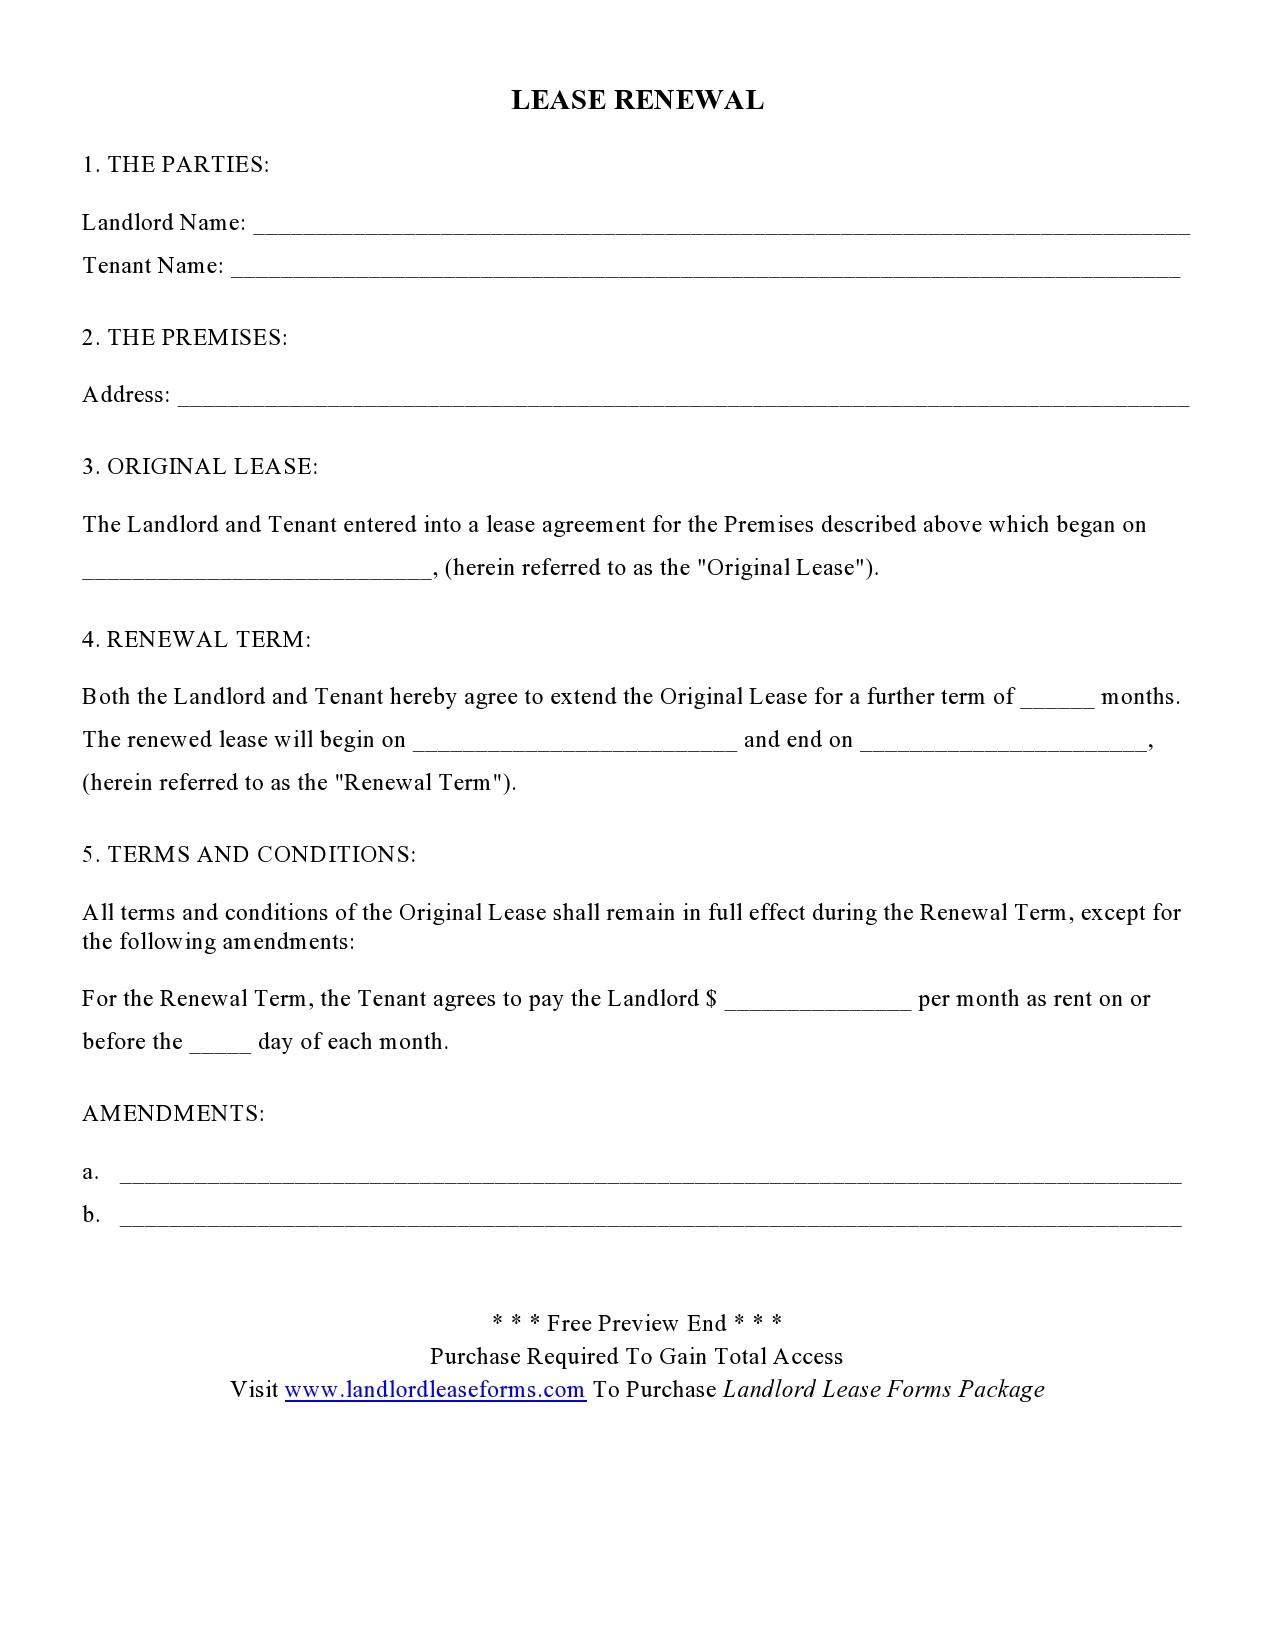 Free lease extension addendum 39